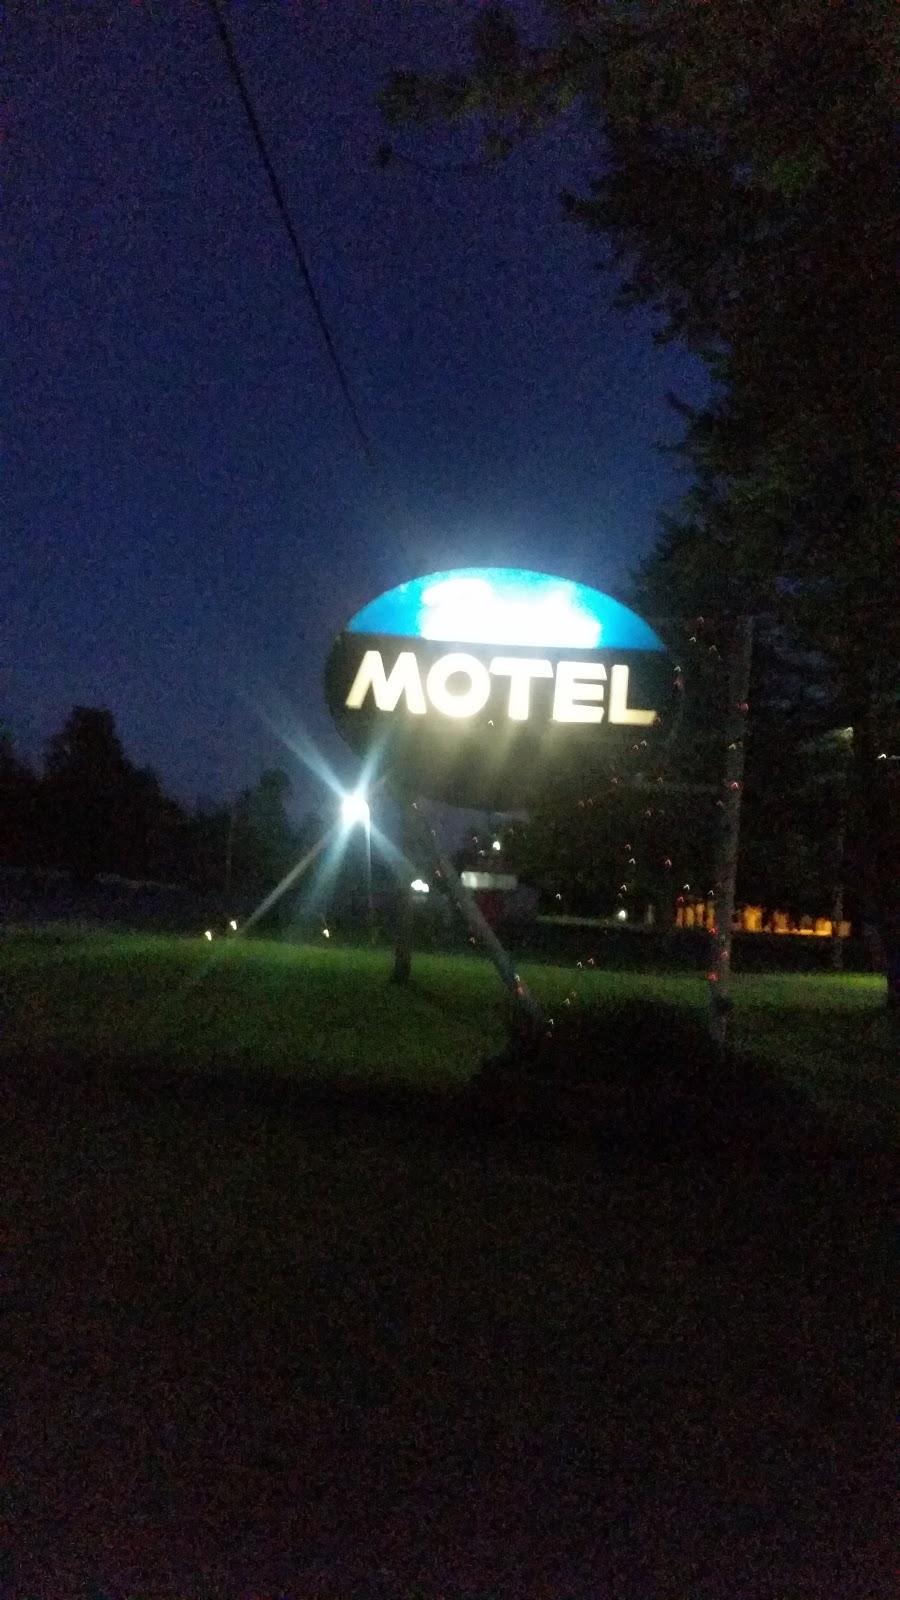 Peck Motel - lodging    Photo 2 of 2   Address: 51704 M 51 N, Dowagiac, MI 49047, USA   Phone: (269) 782-2188